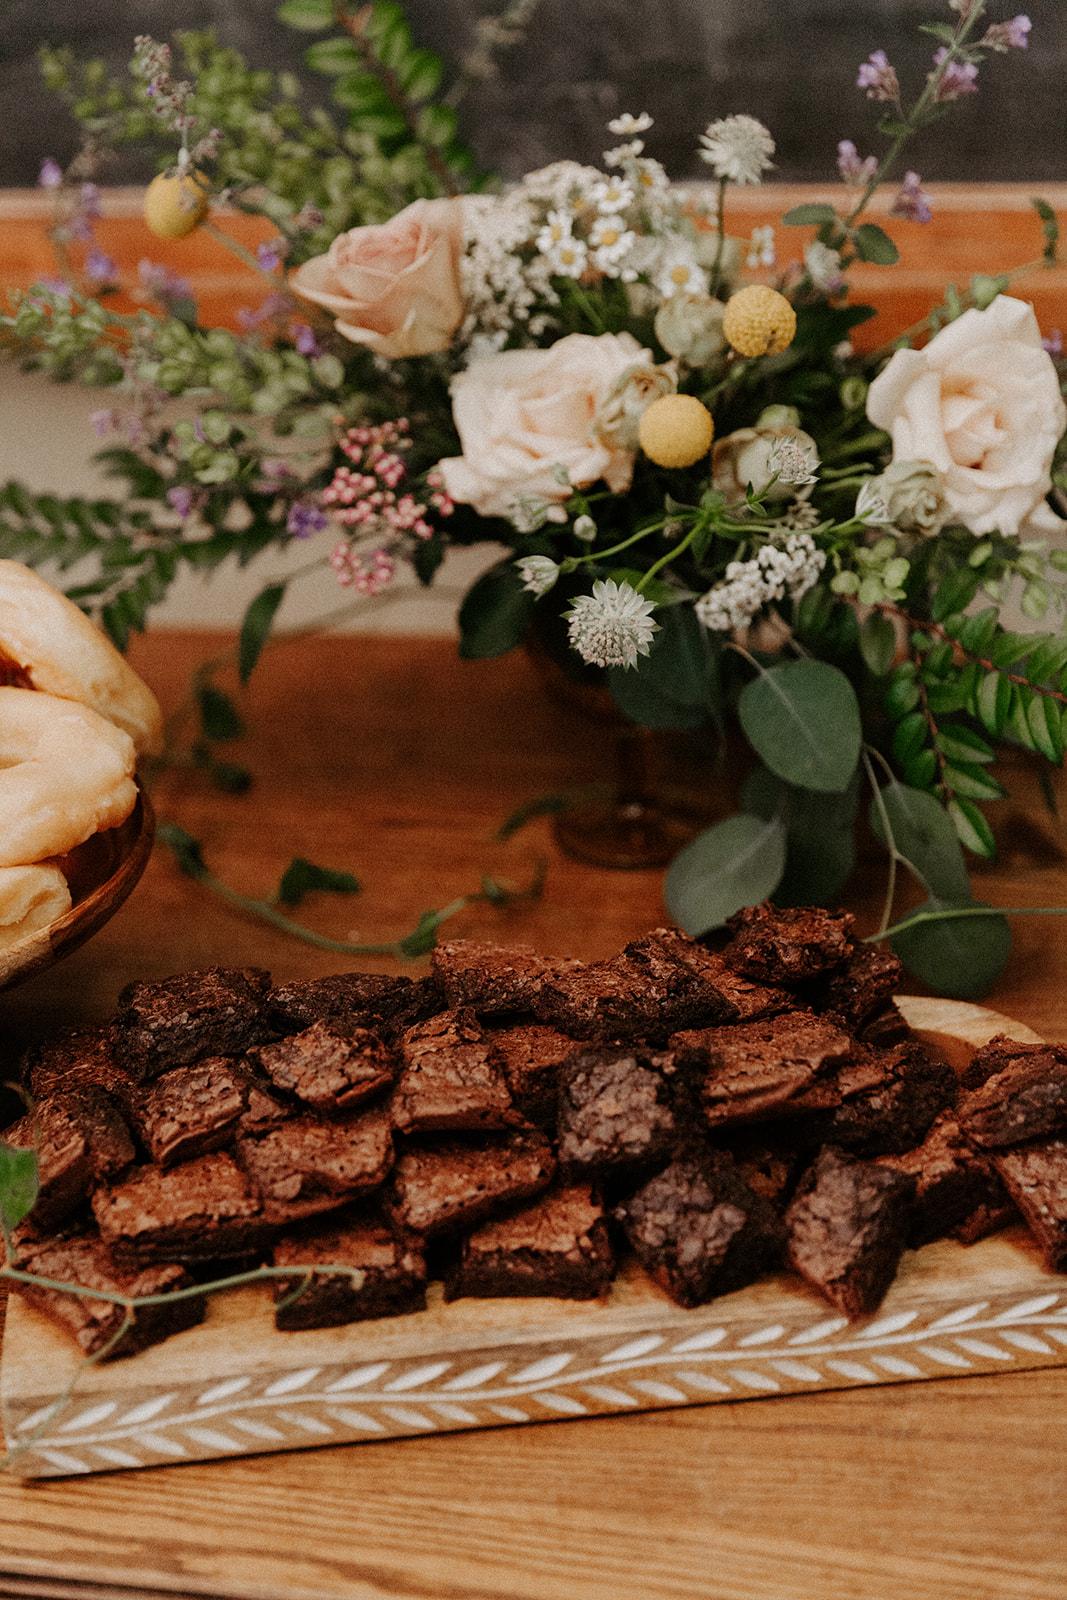 camp_wokanda_peoria_illinois_wedding_photographer_wright_photographs_bliese_0901.jpg